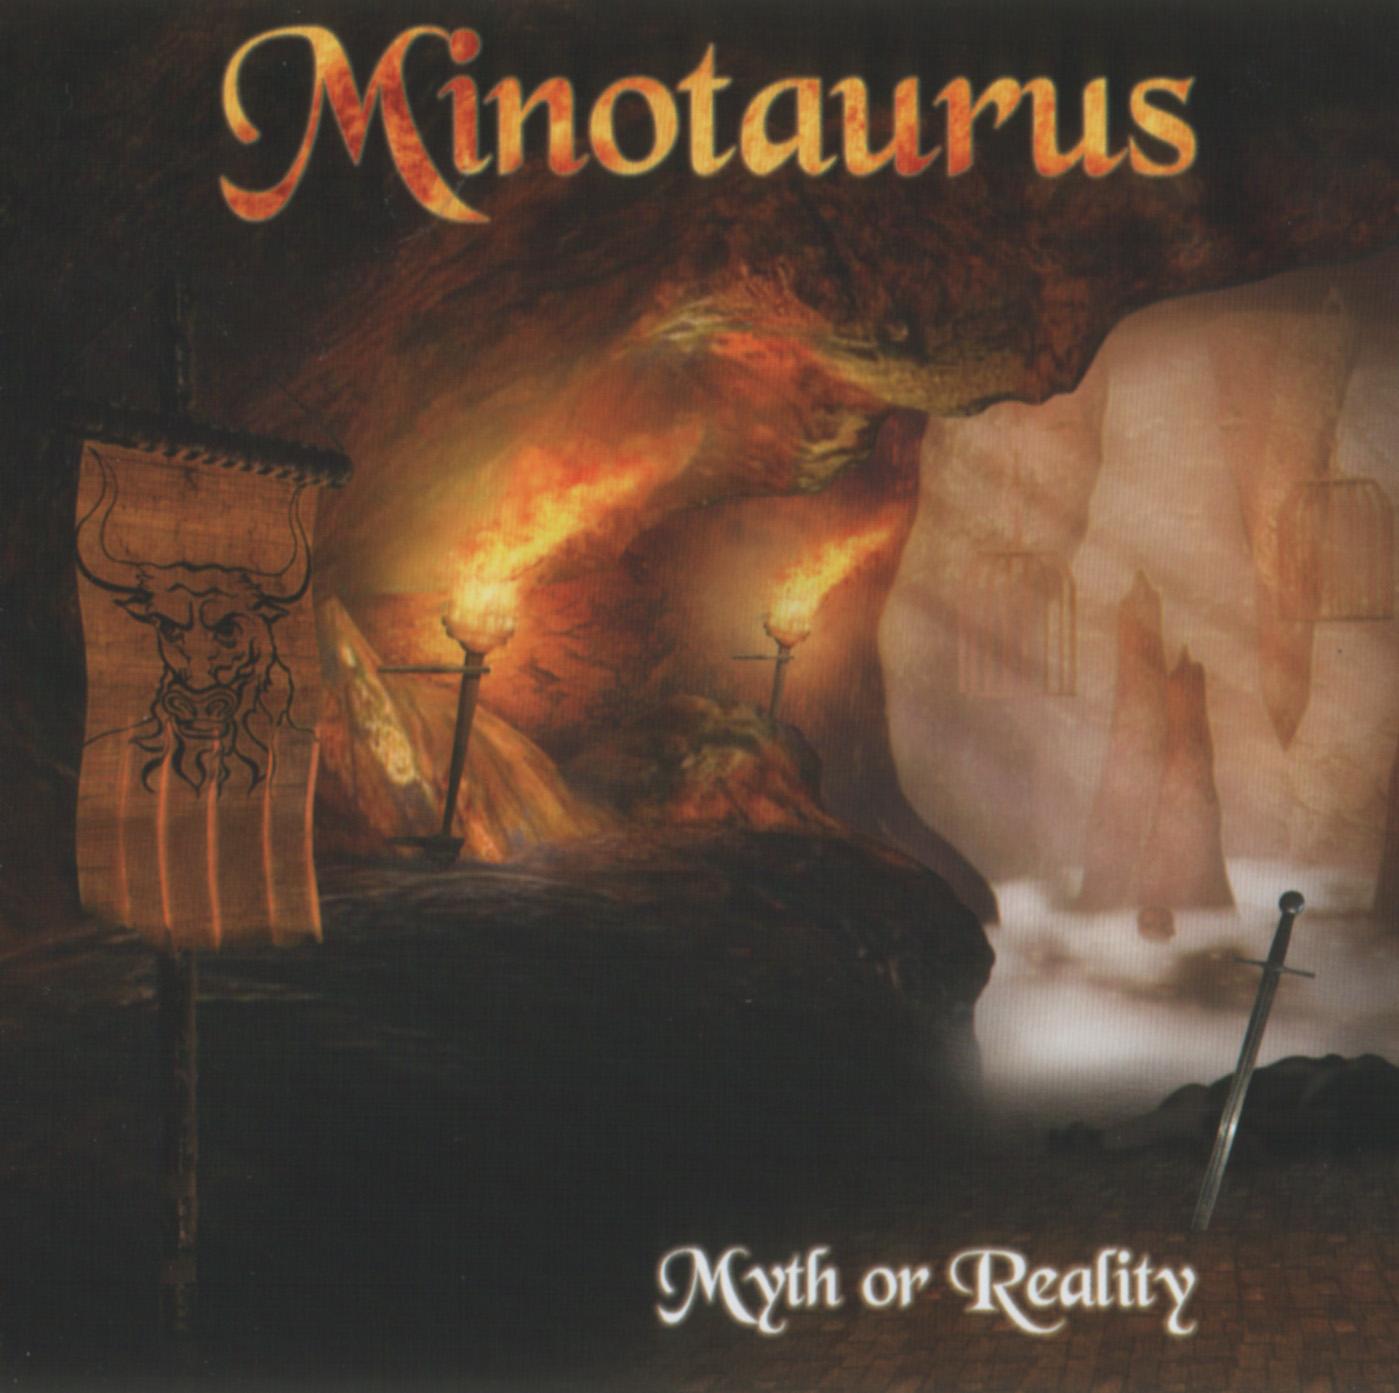 Minotaurus В'dВ'qВ'nВ'sВ'hВ'b В'eВ'`В'mВ'sВ'`В'rВ'x В'`В'qВ's В'iВ'hВ'yВ'y nude scene